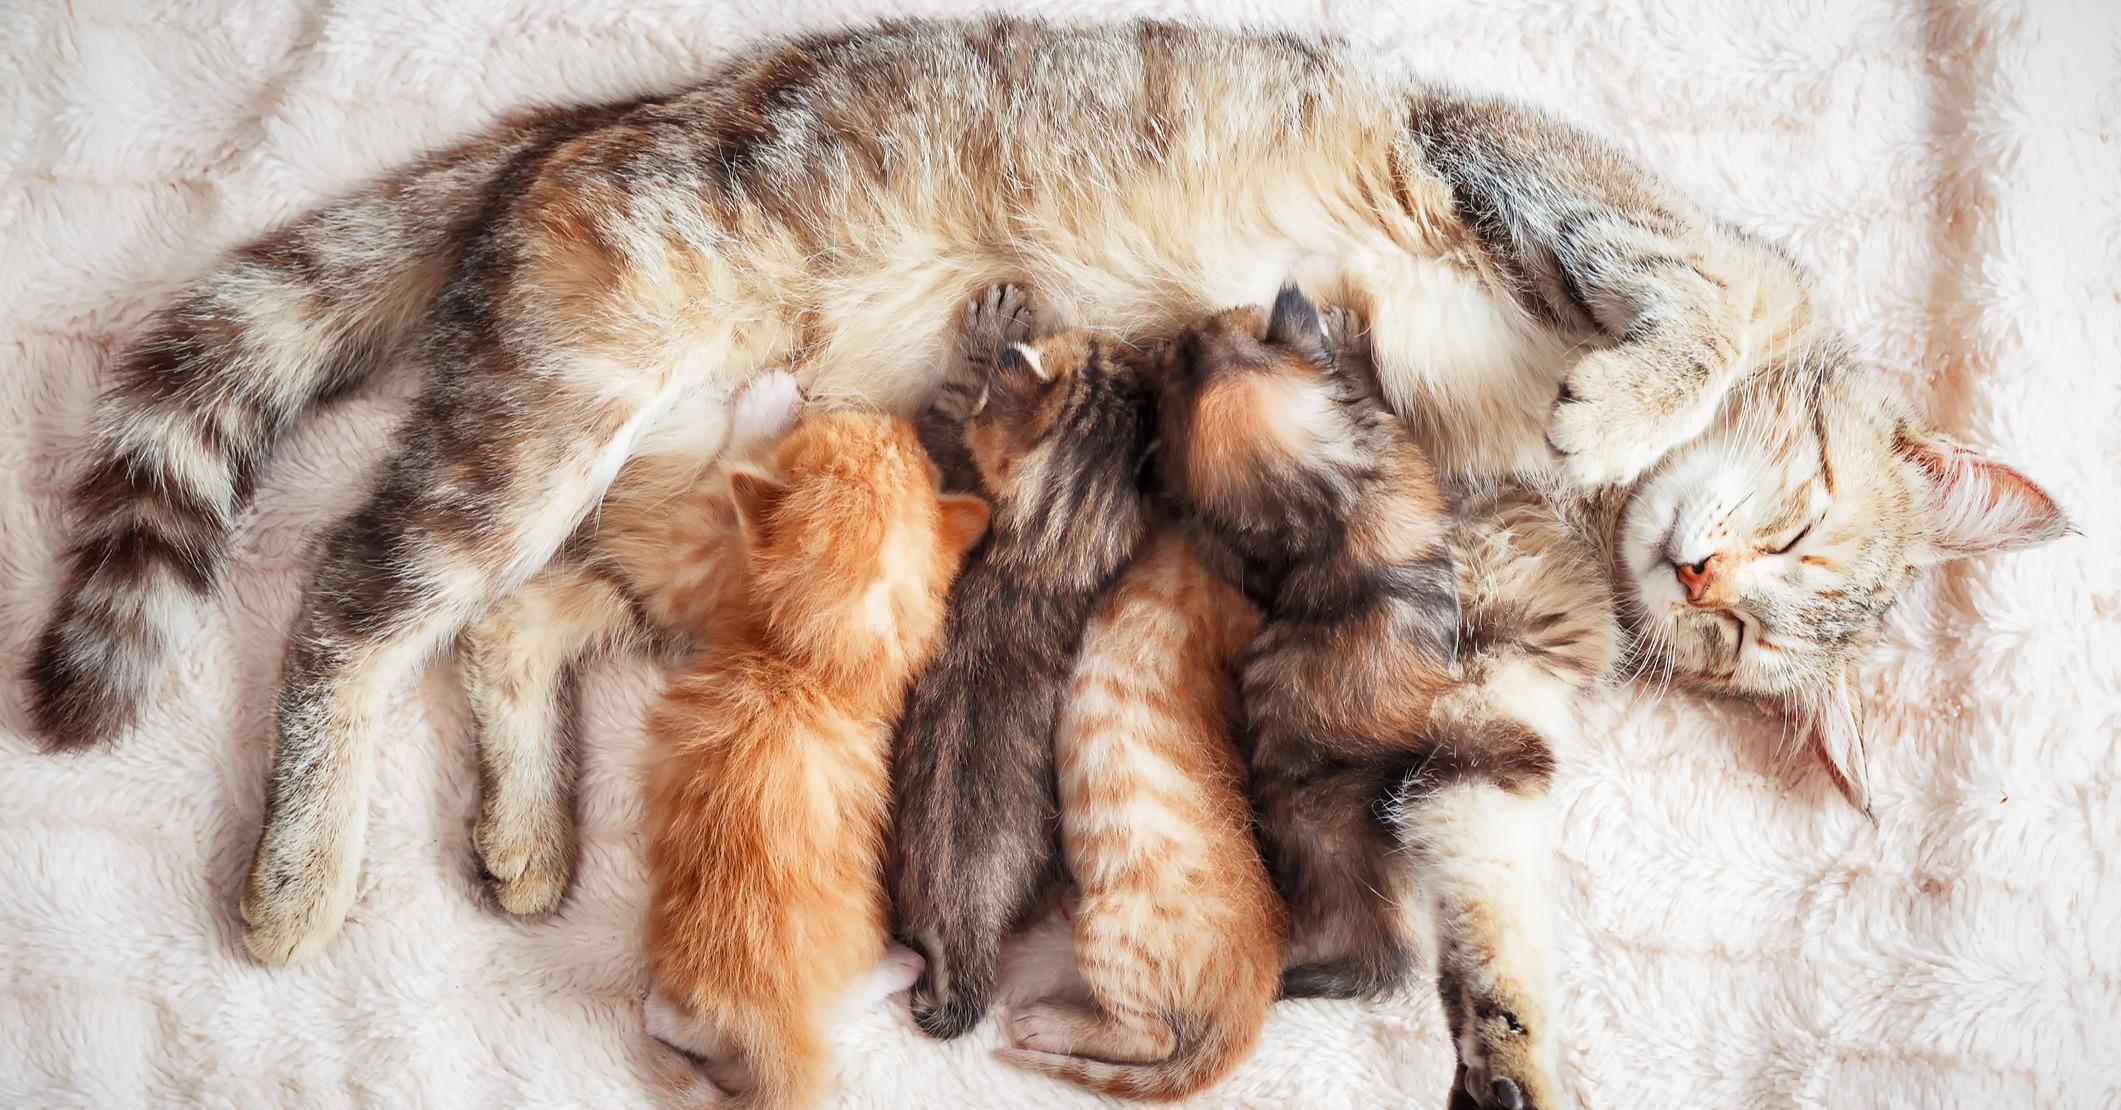 cute kittens nursing